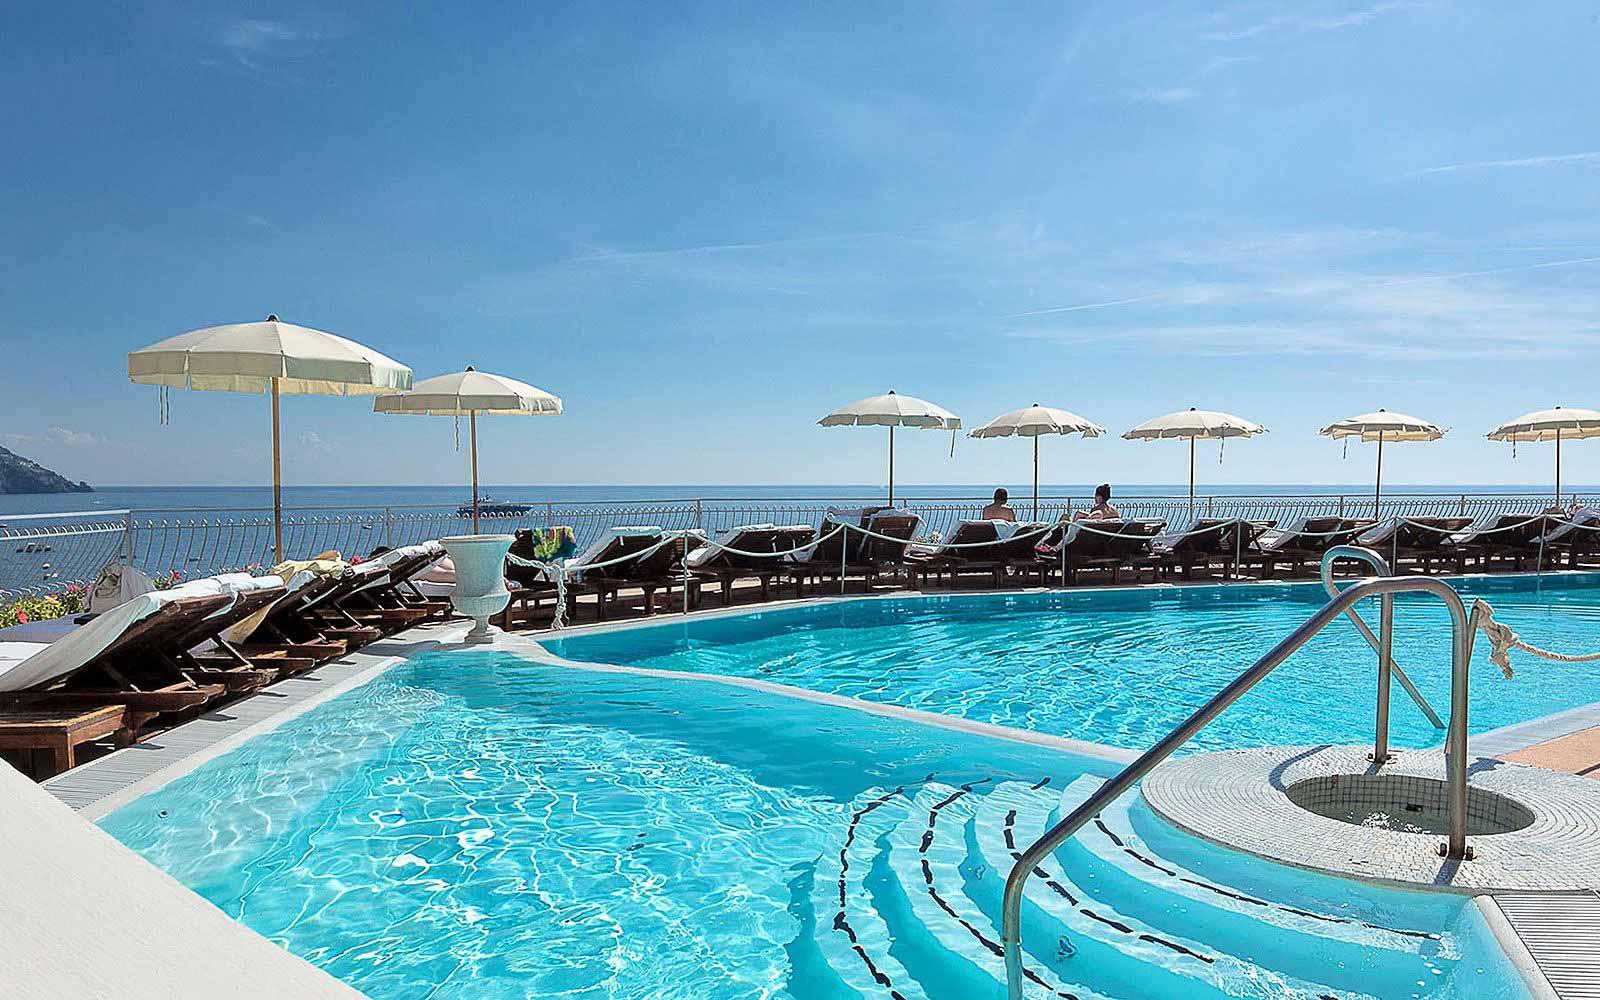 Swimming pool of the Covo Dei Saraceni